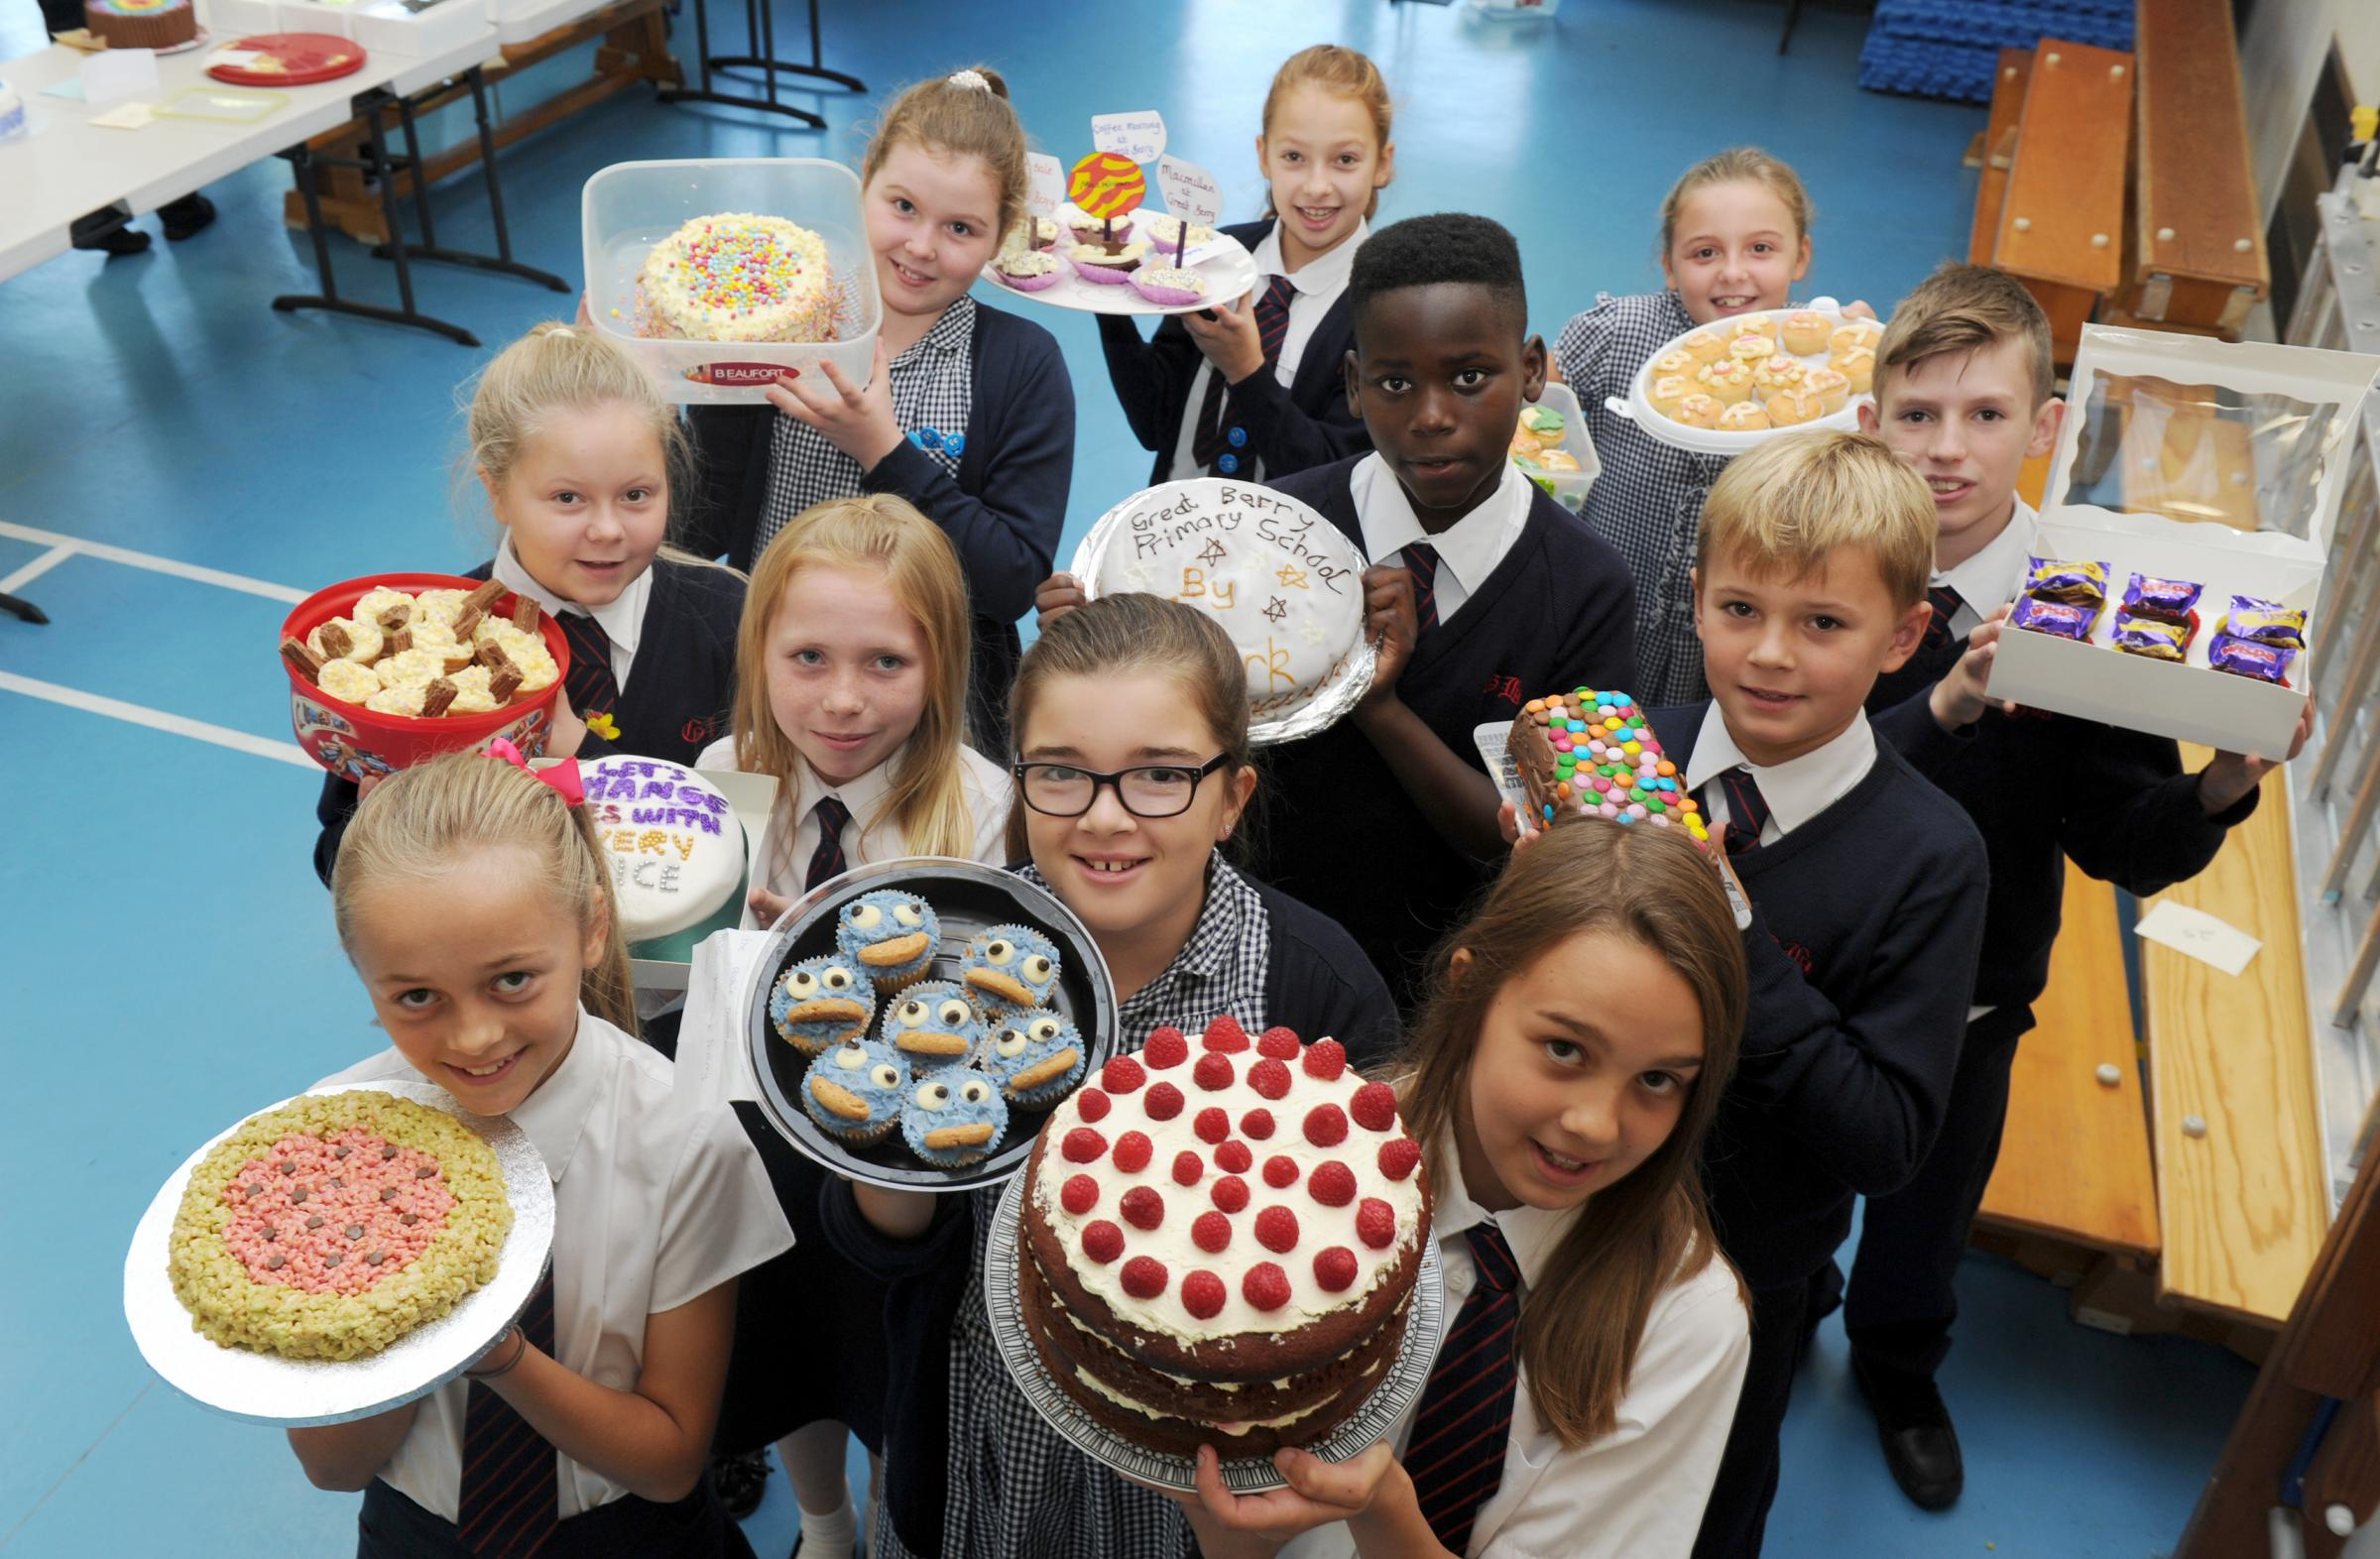 Maldon venues raise hundreds for Macmillan Cancer Trust through charity coffee mornings